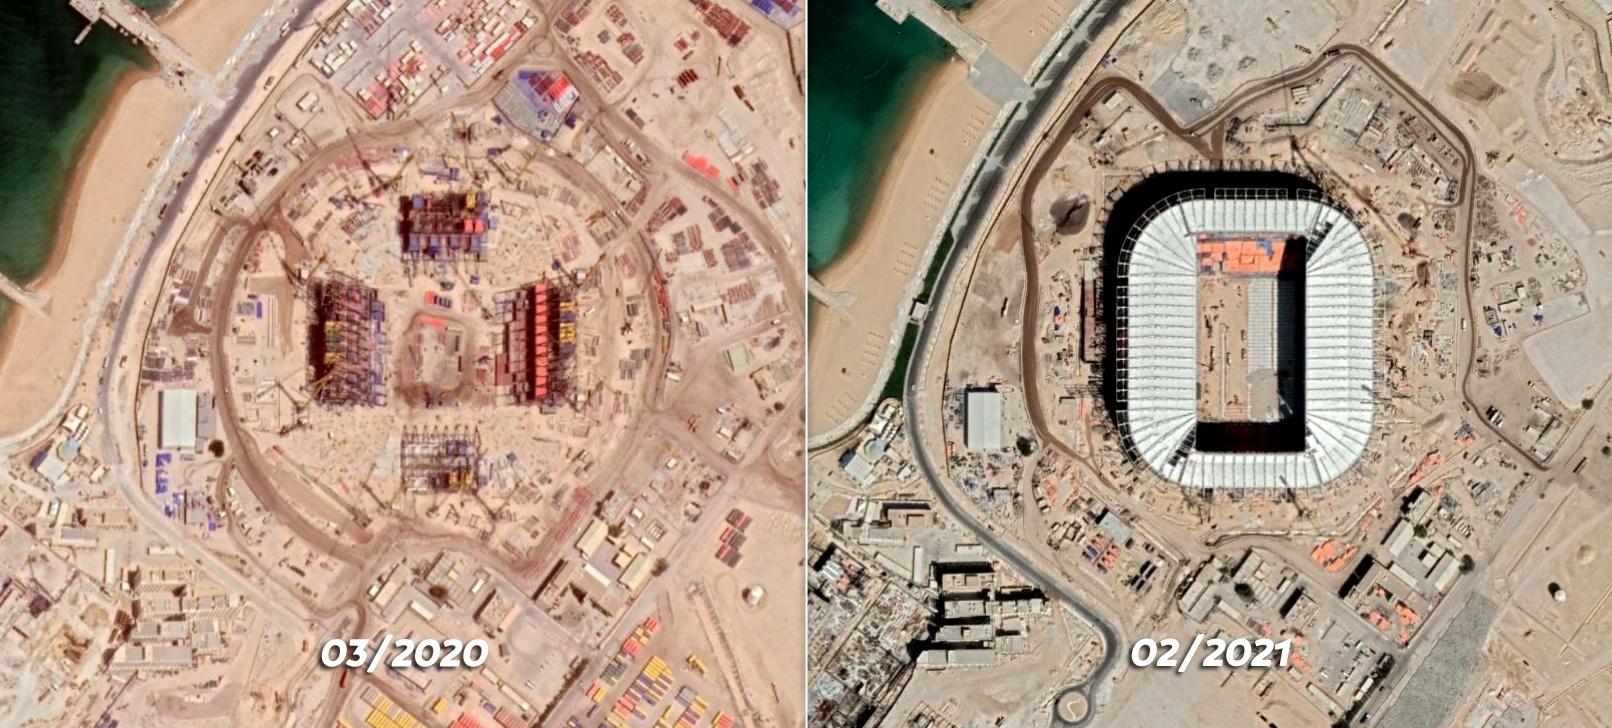 Ras Abu Aboud Stadium, Doha, Qatar